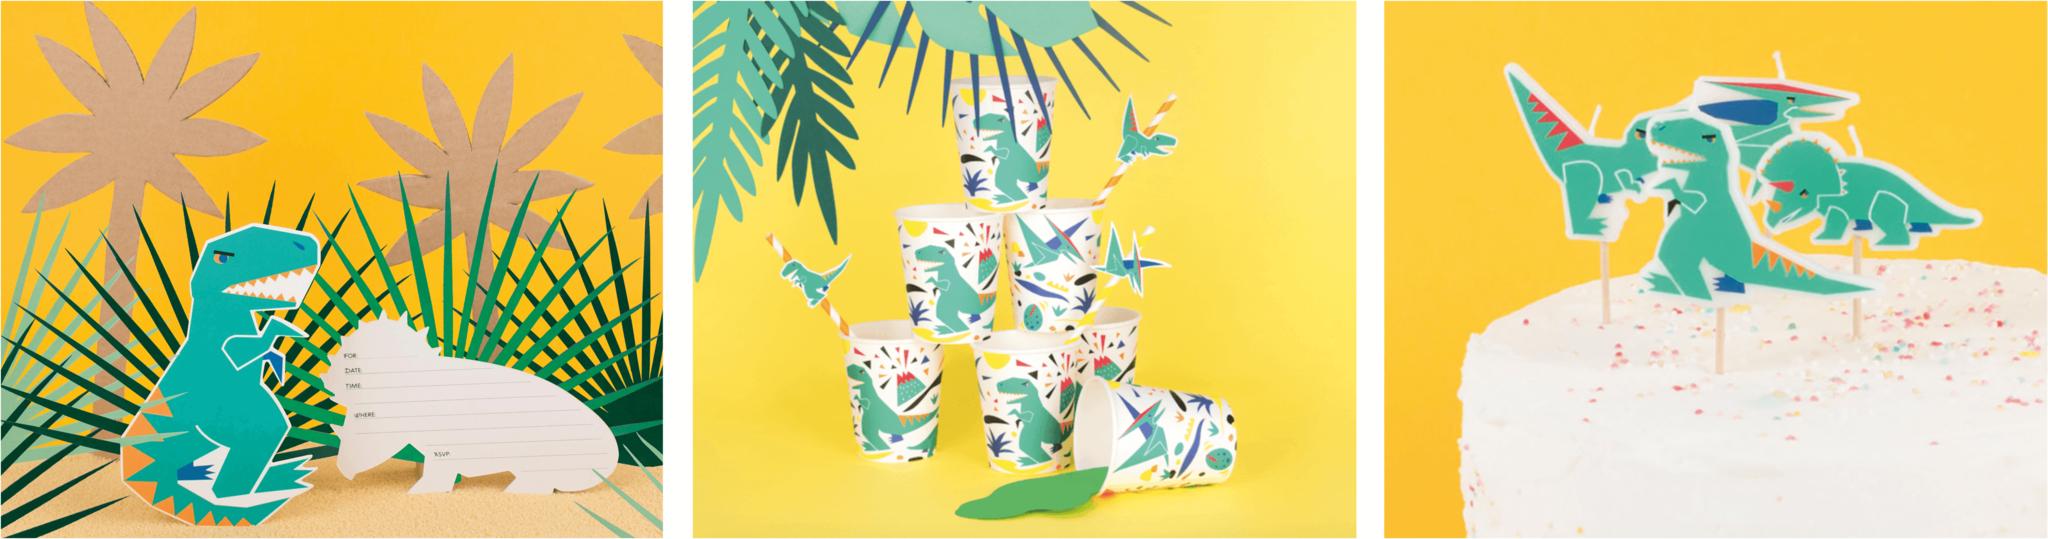 Kinderfeestje versiering thema dinosaurus